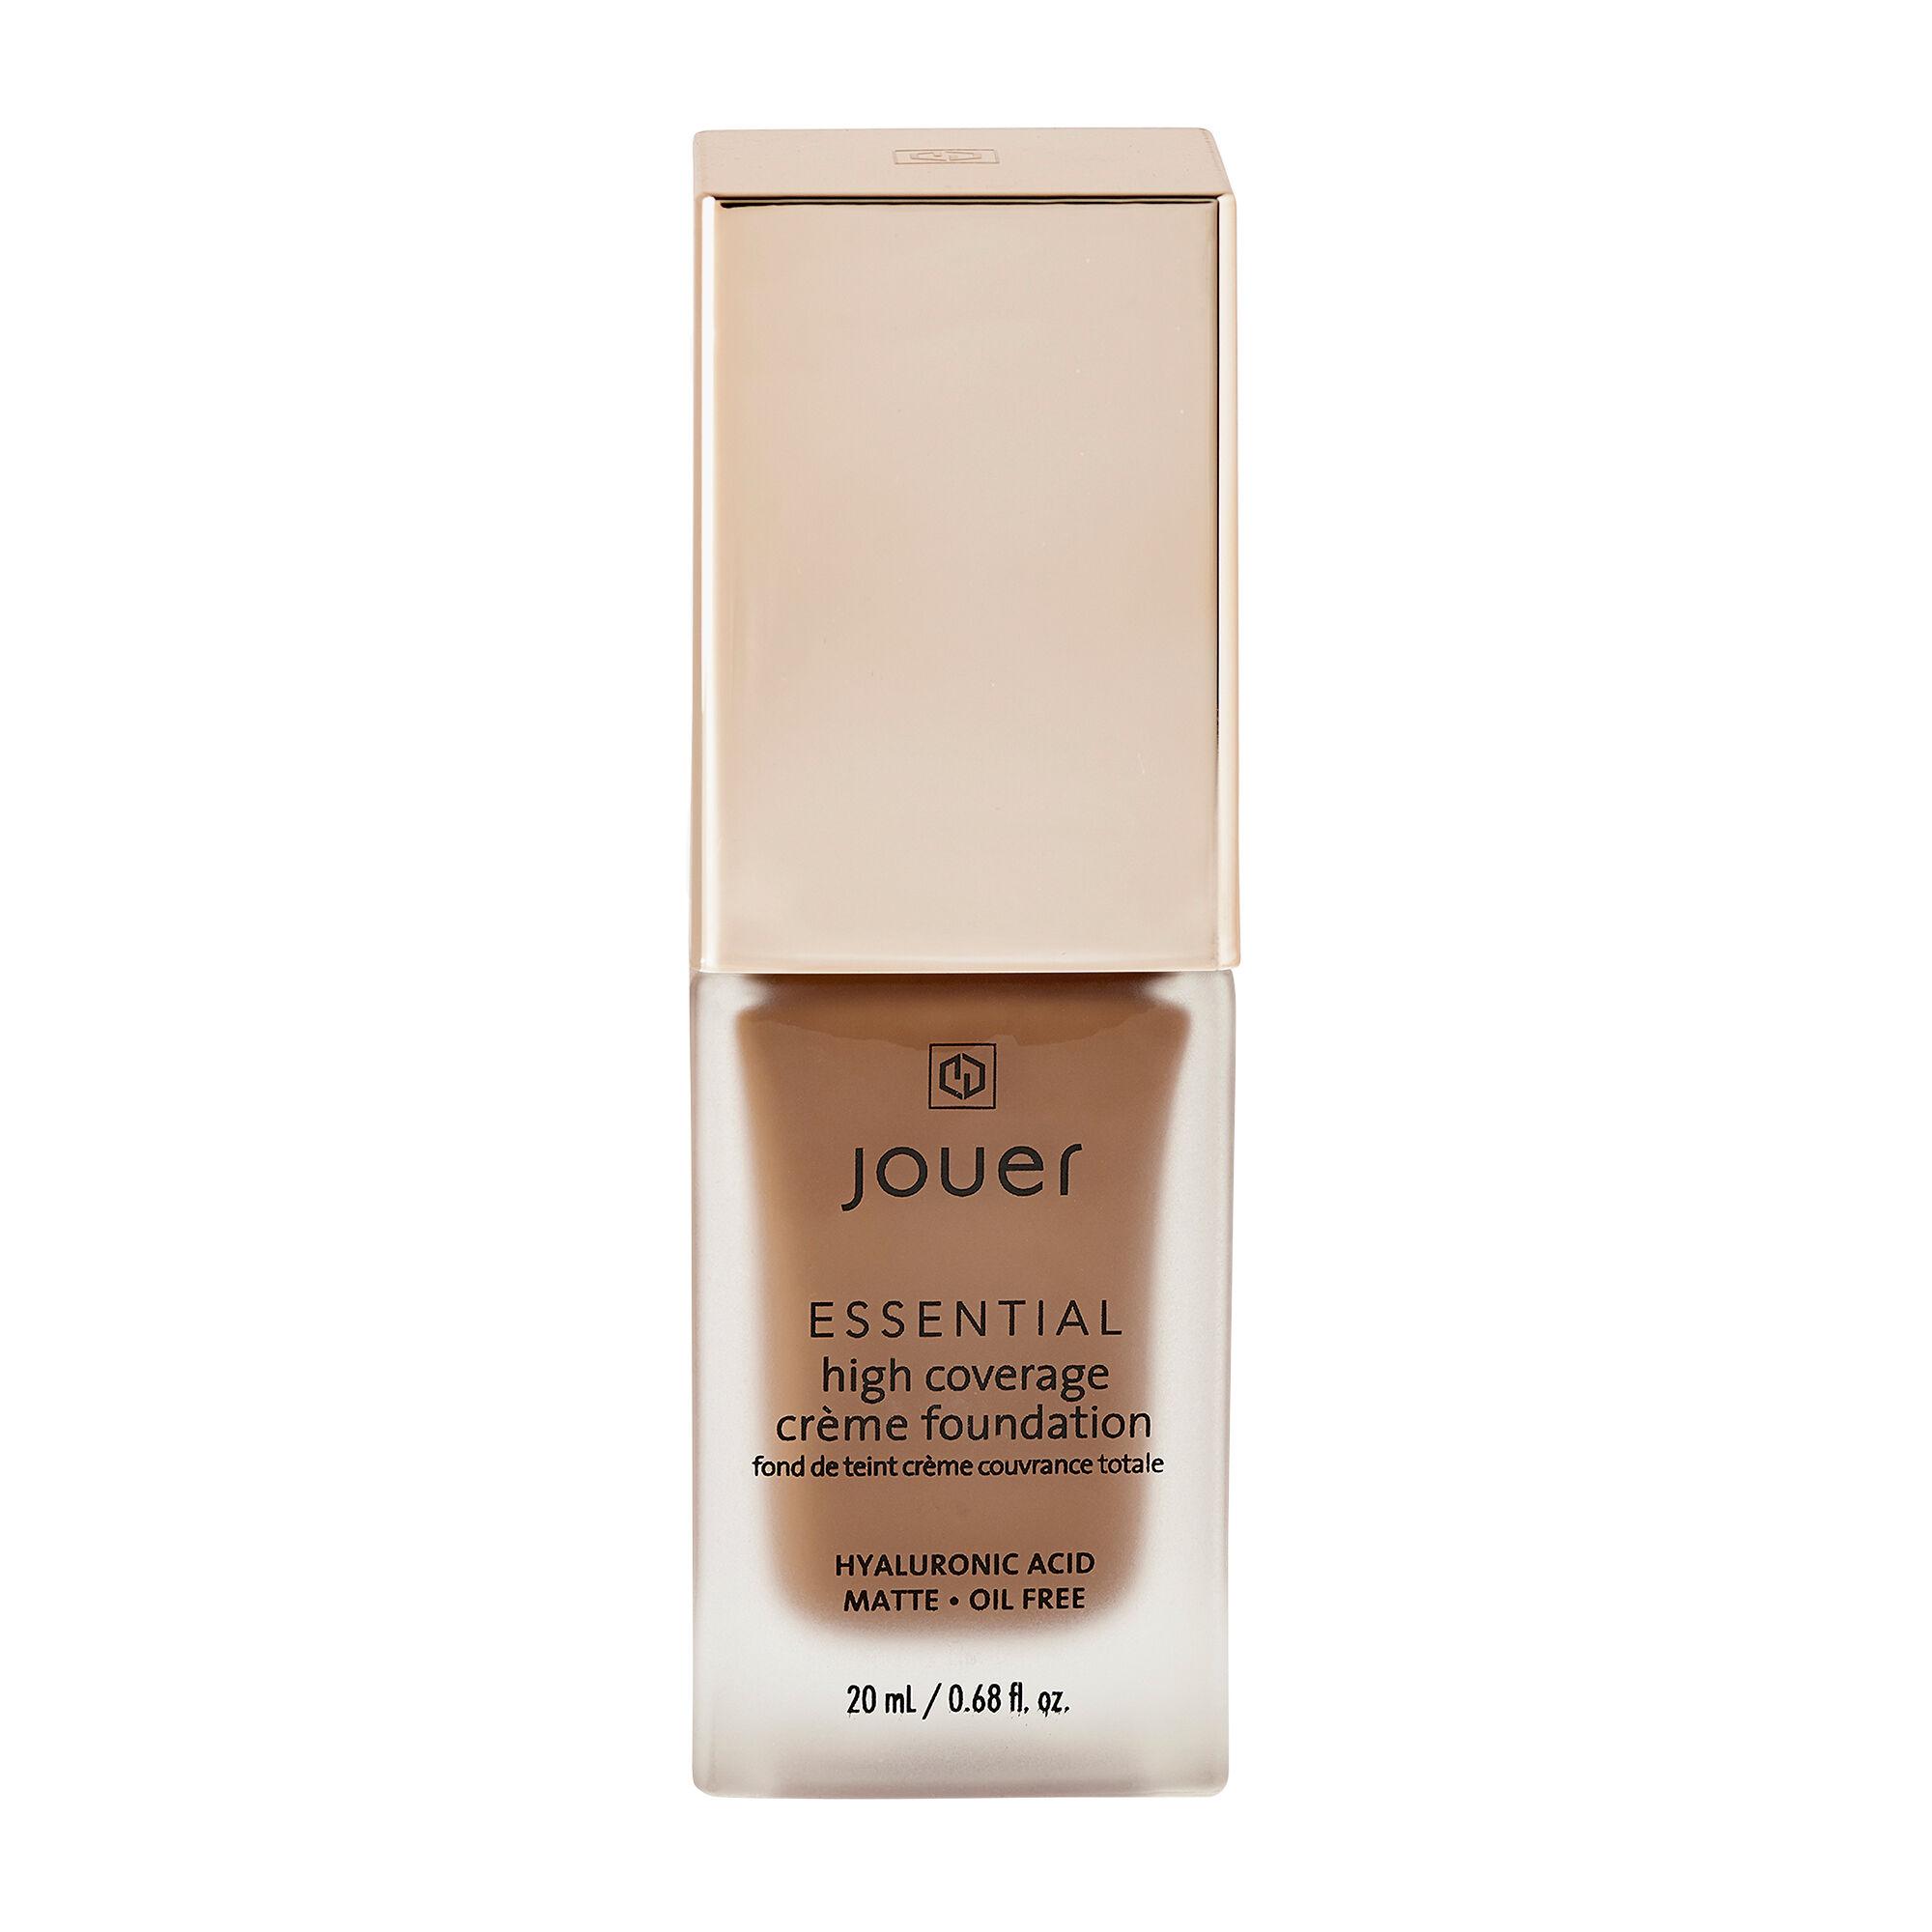 Jouer Cosmetics Essential High Coverage Creme Foundation Praline 20ml